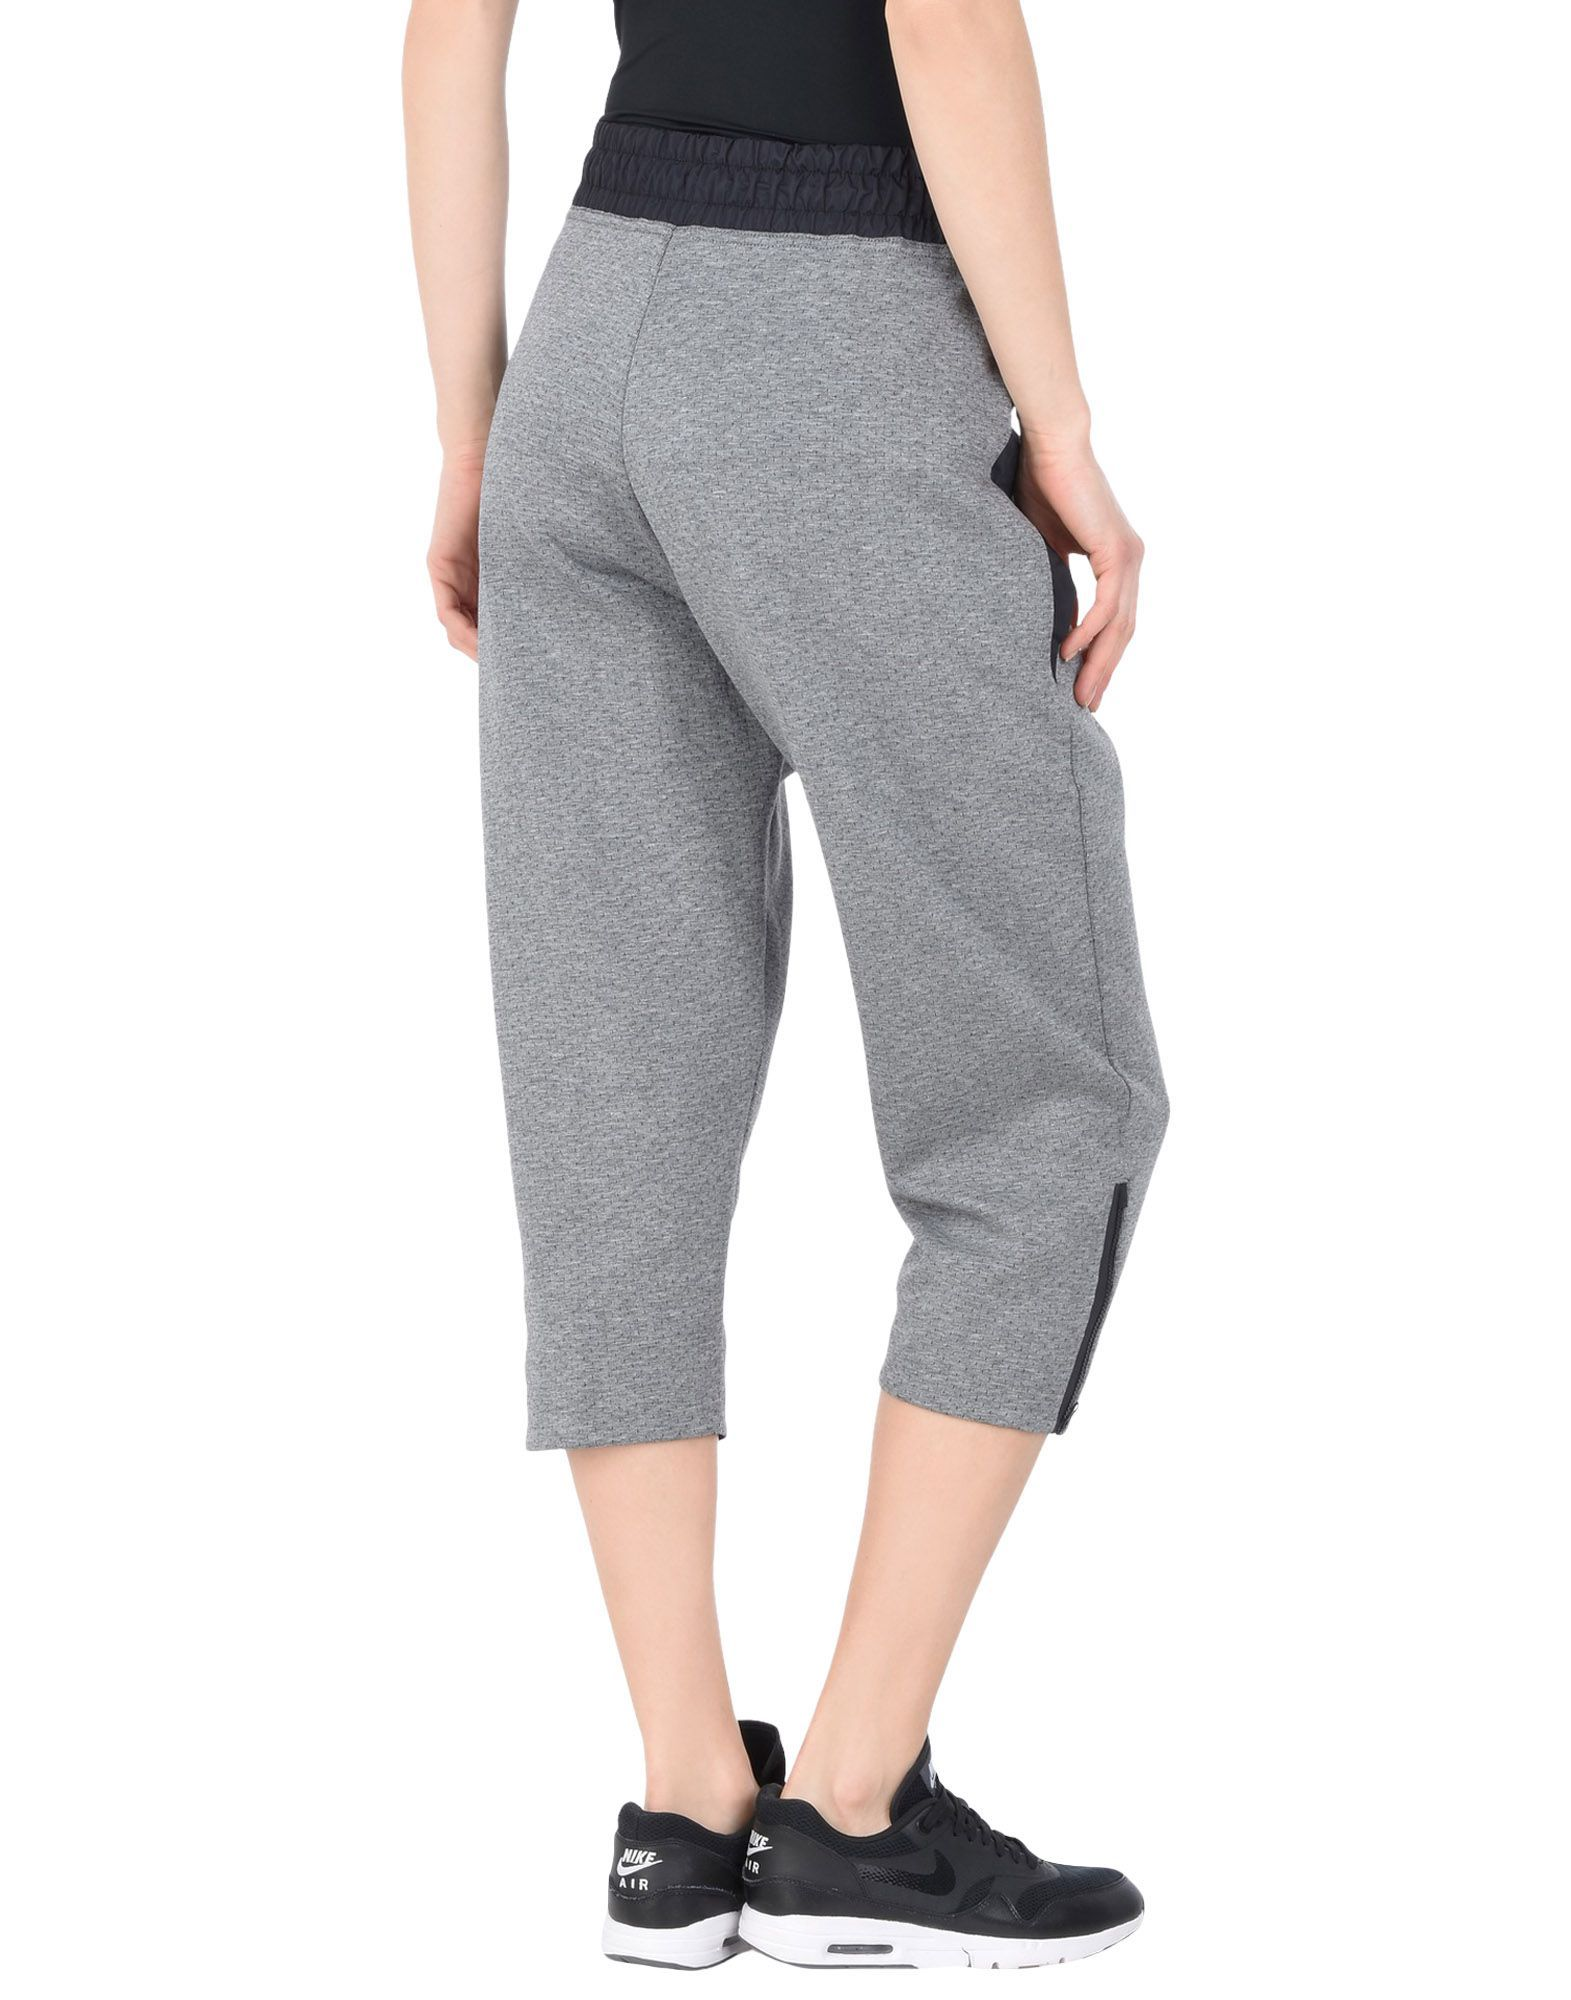 Nike Grey Cotton 3/4-Length Trousers